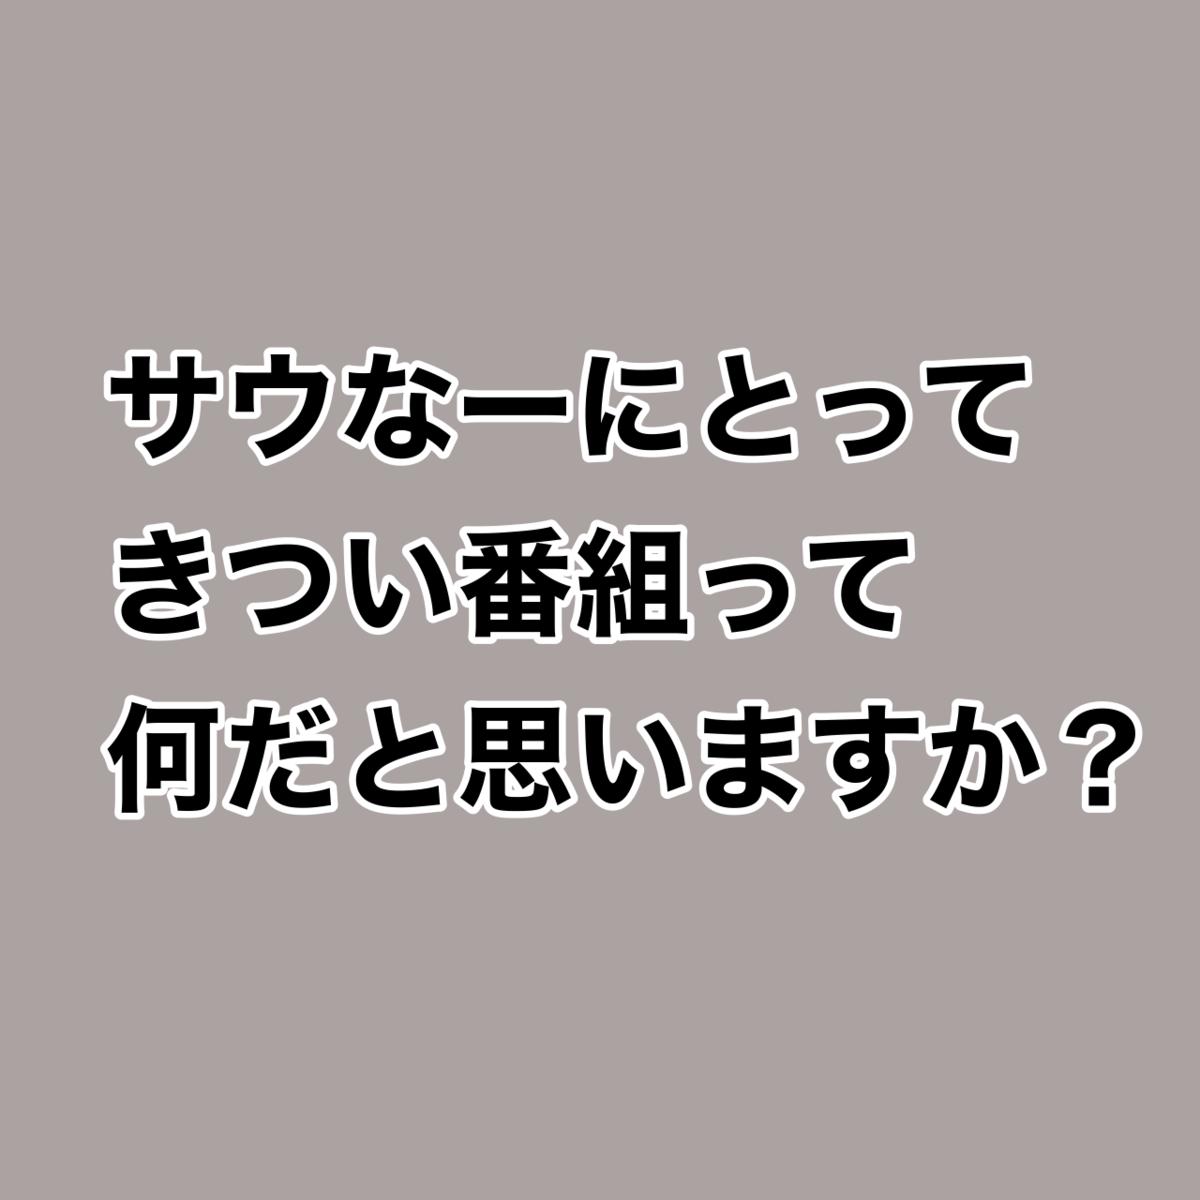 f:id:kinoko1629:20211006232628p:plain